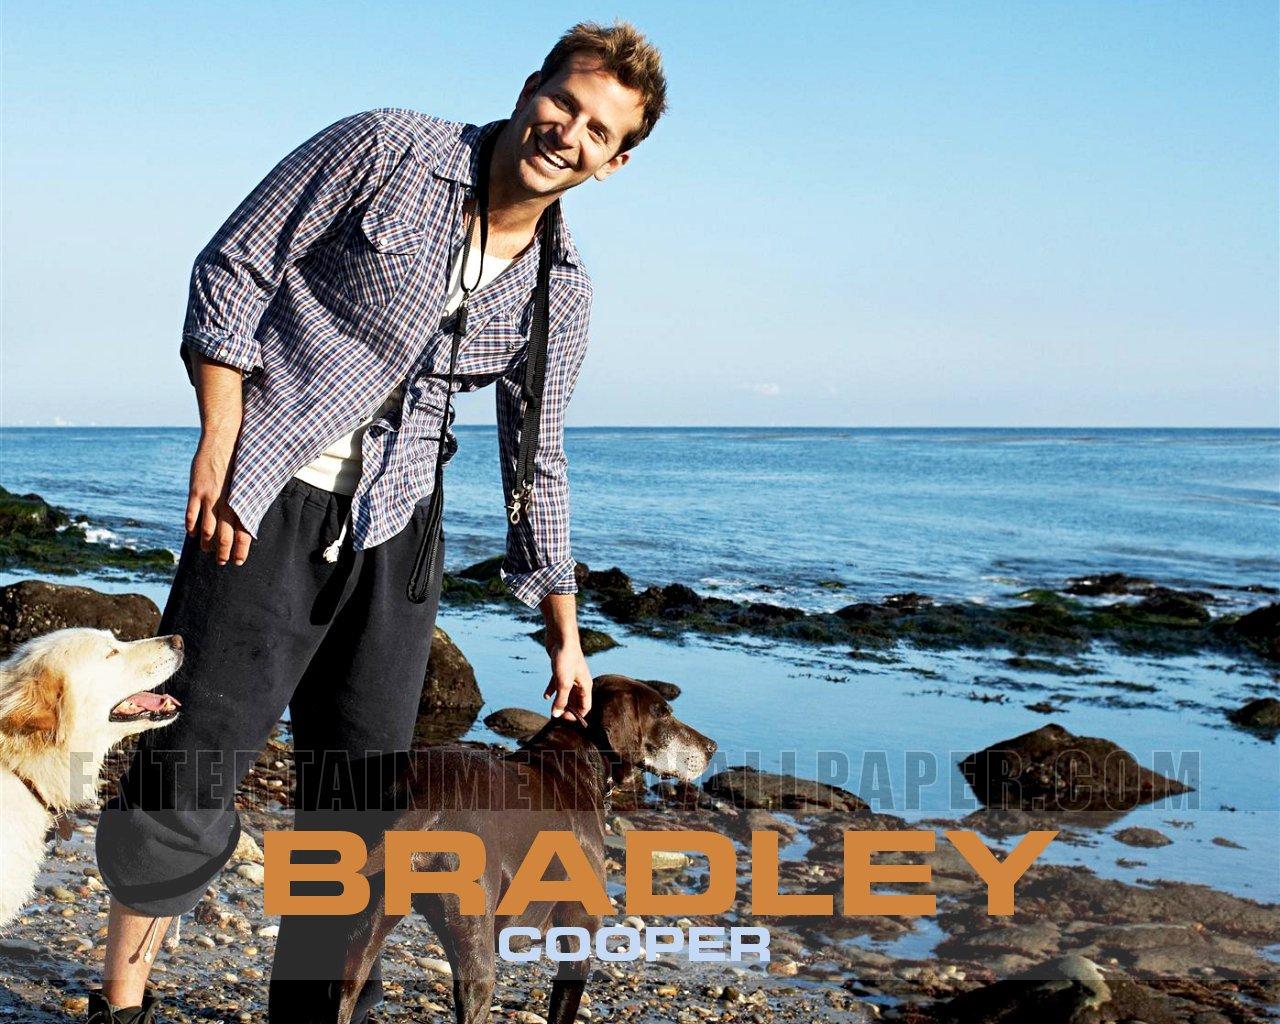 bradley cooper   Bradley Cooper Wallpaper 23904577 1280x1024